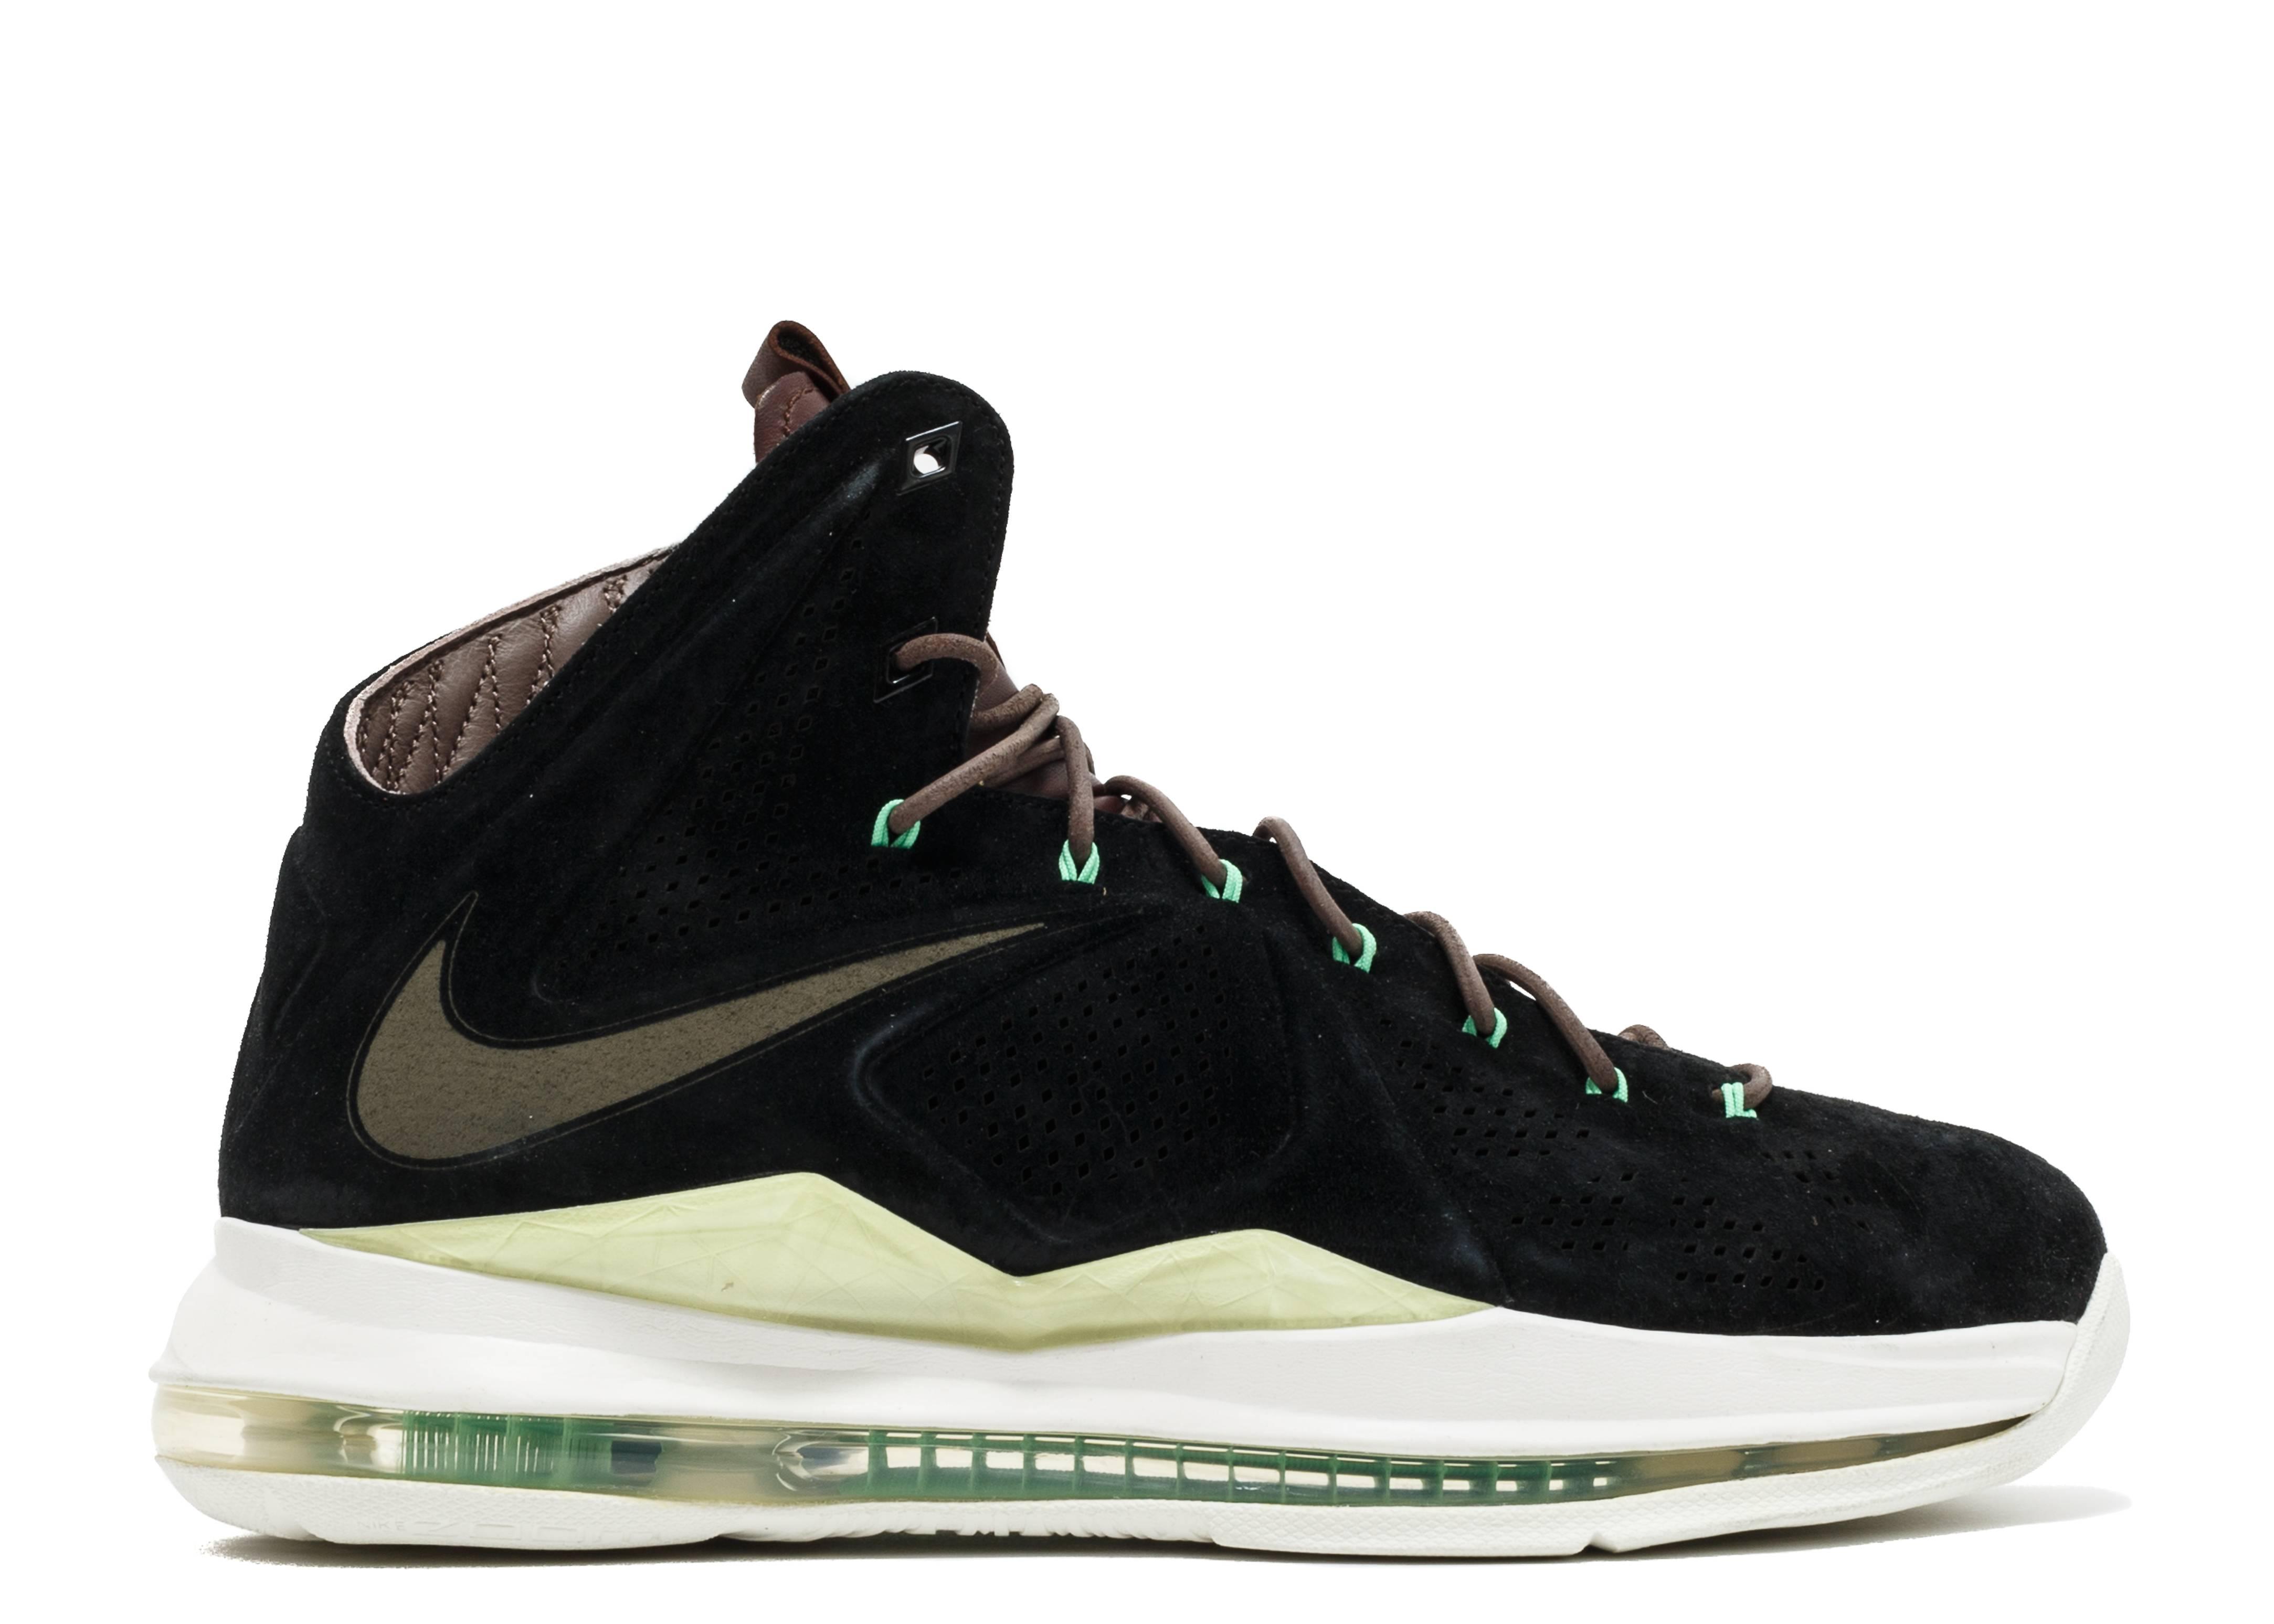 lebron 10 shoes size 6